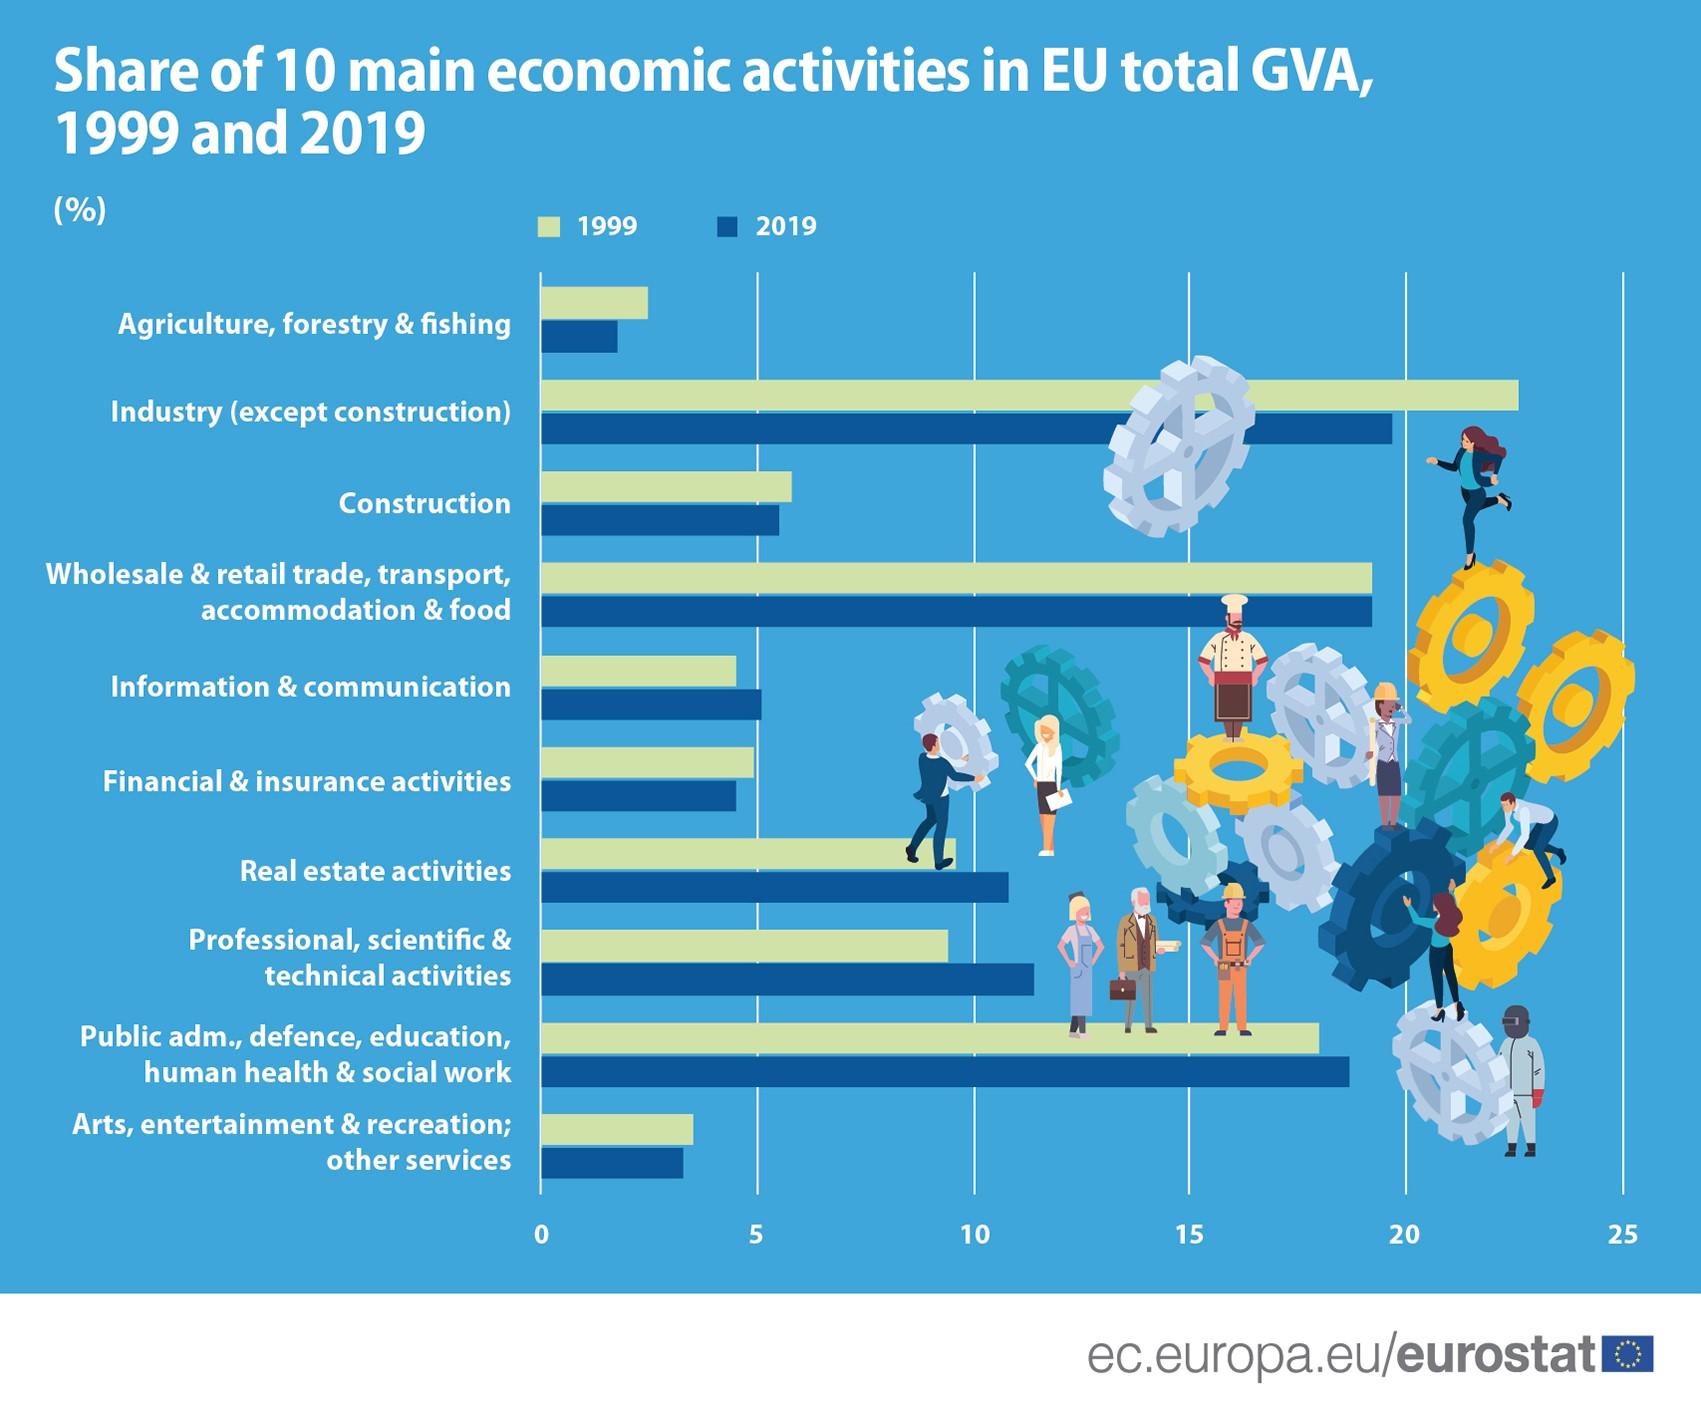 Share of 10 main economic activities in total GVA, 2019